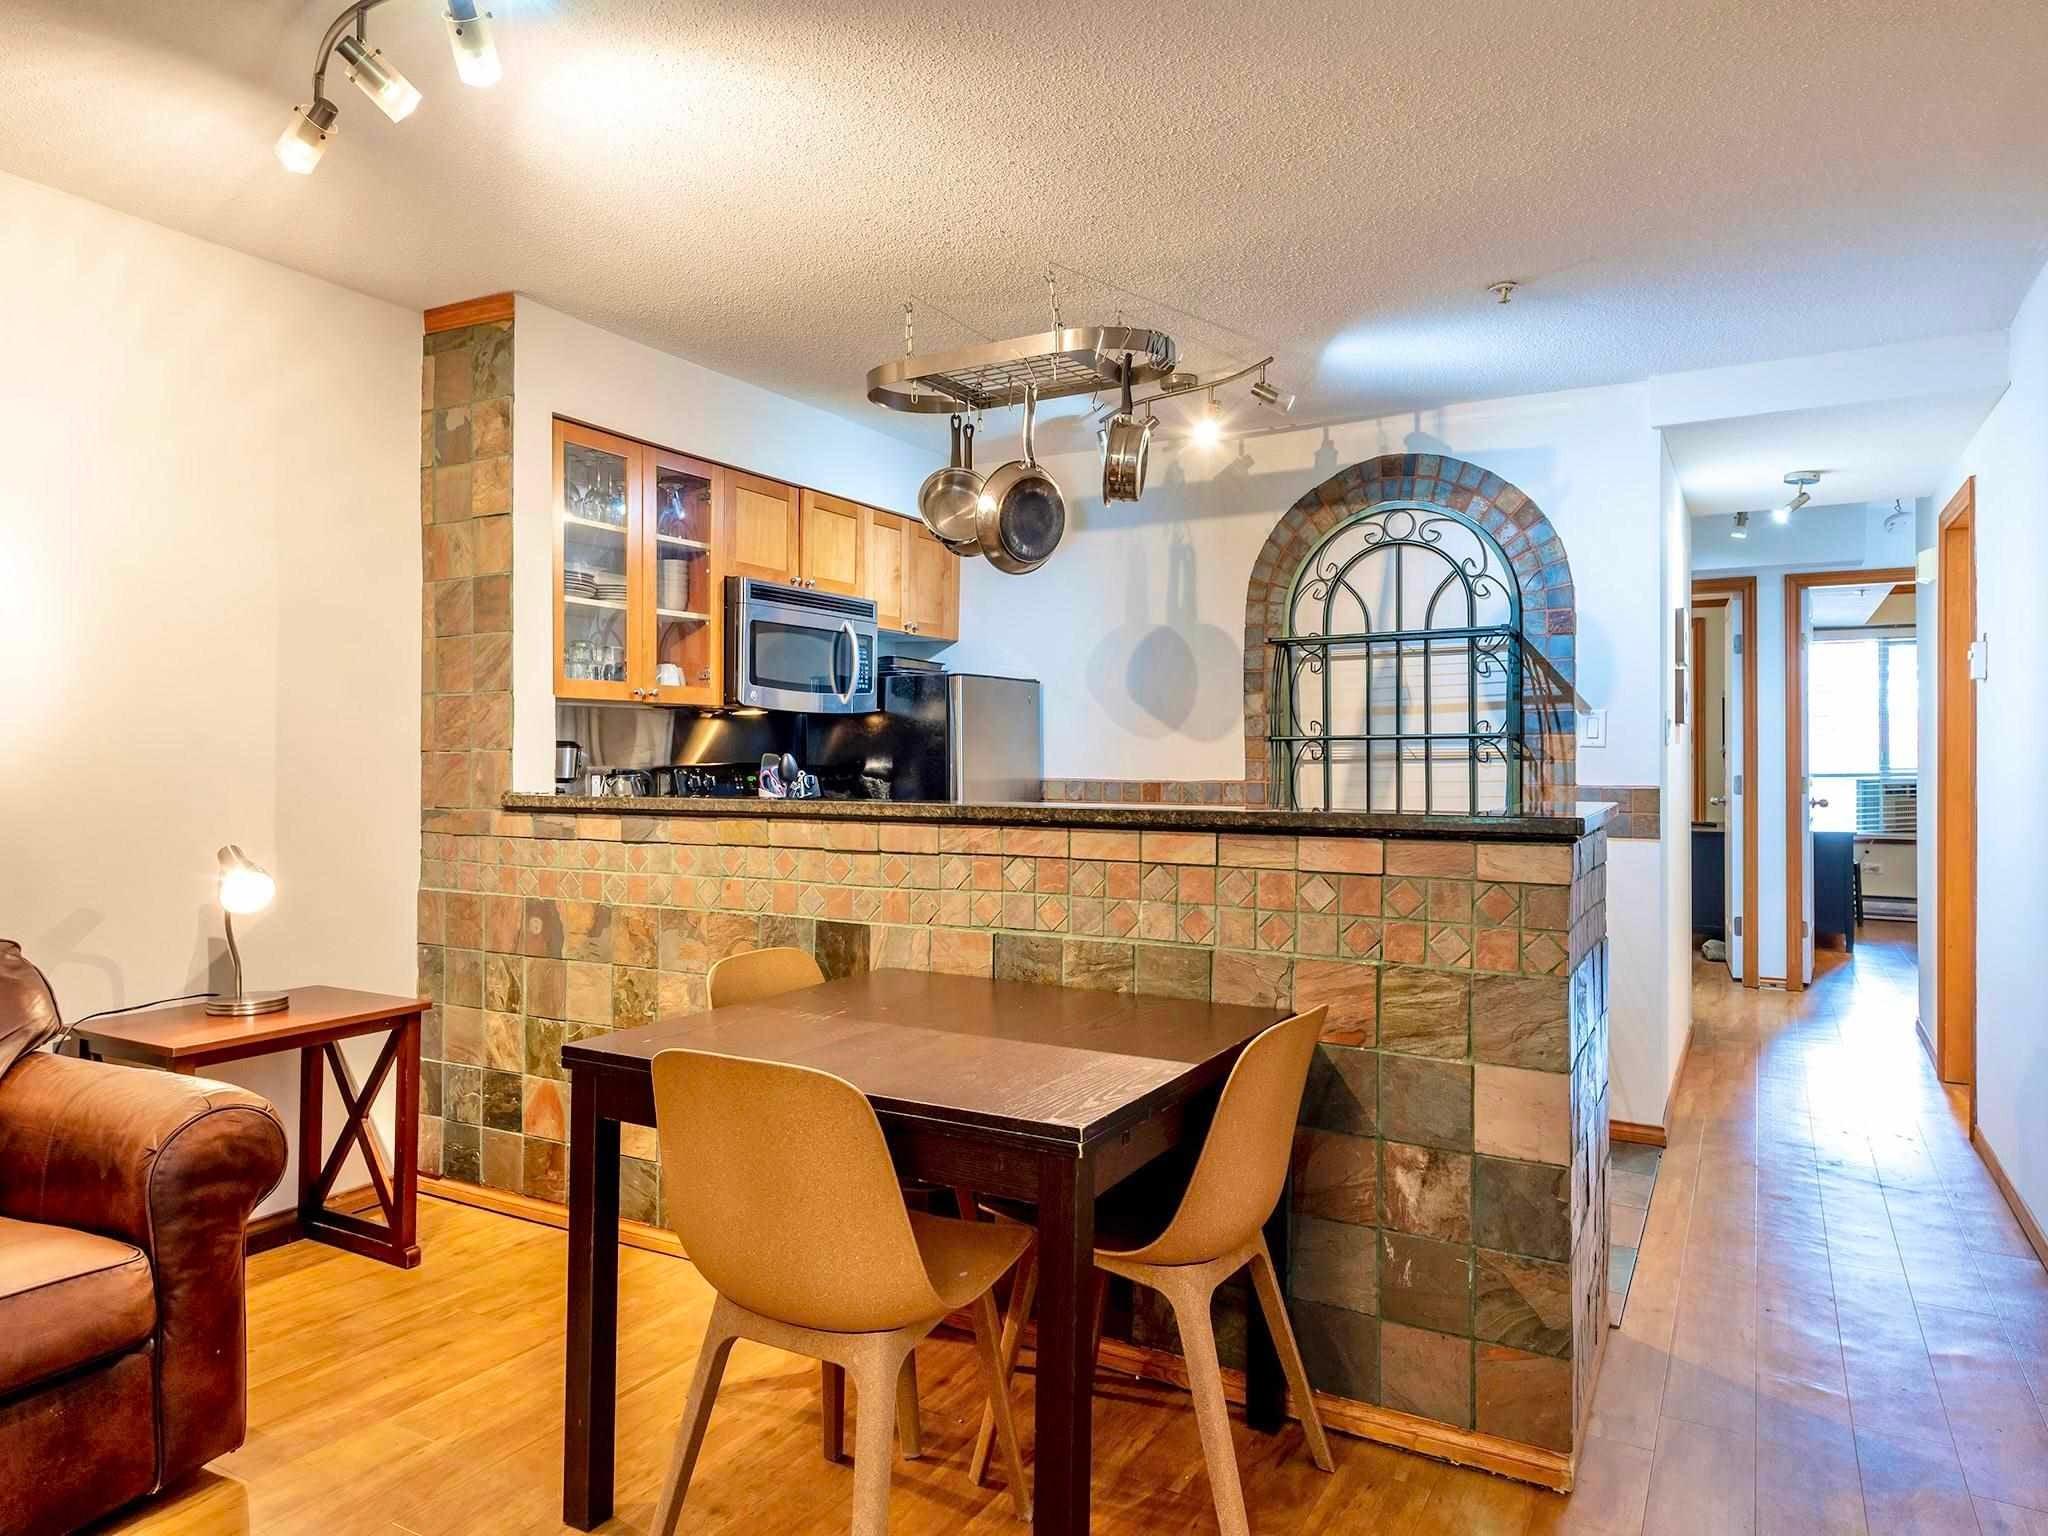 73 4388 NORTHLANDS BOULEVARD - Whistler Village Townhouse for sale, 2 Bedrooms (R2580863) - #6